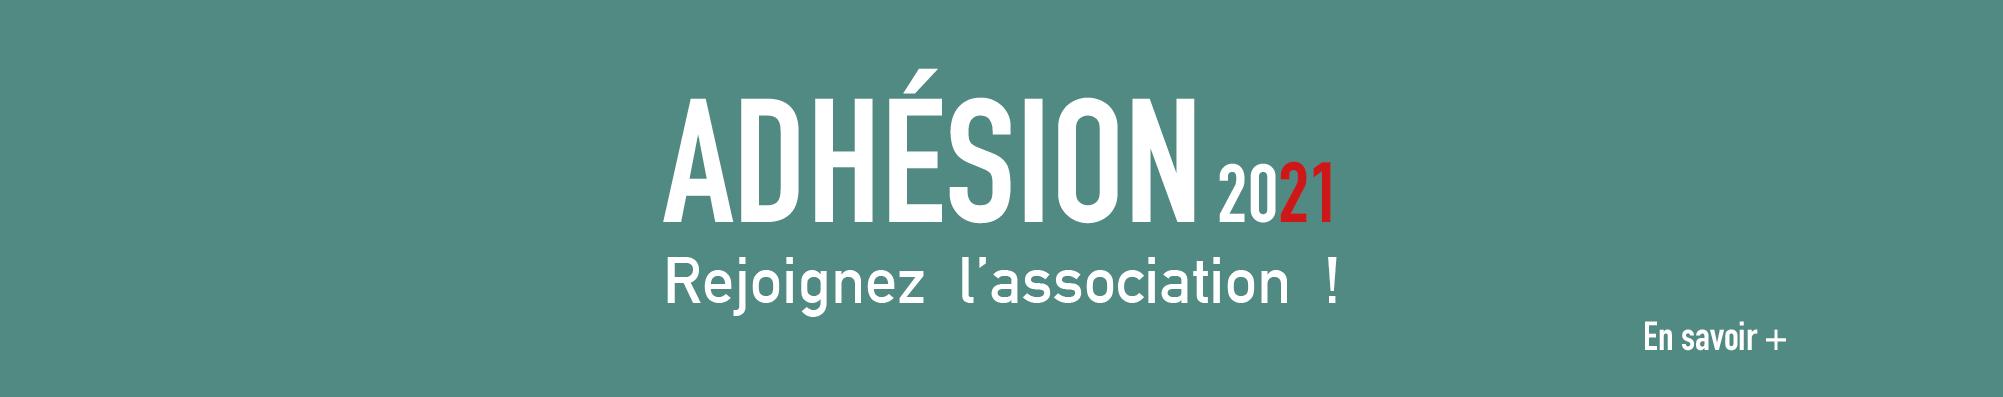 adhésion20214